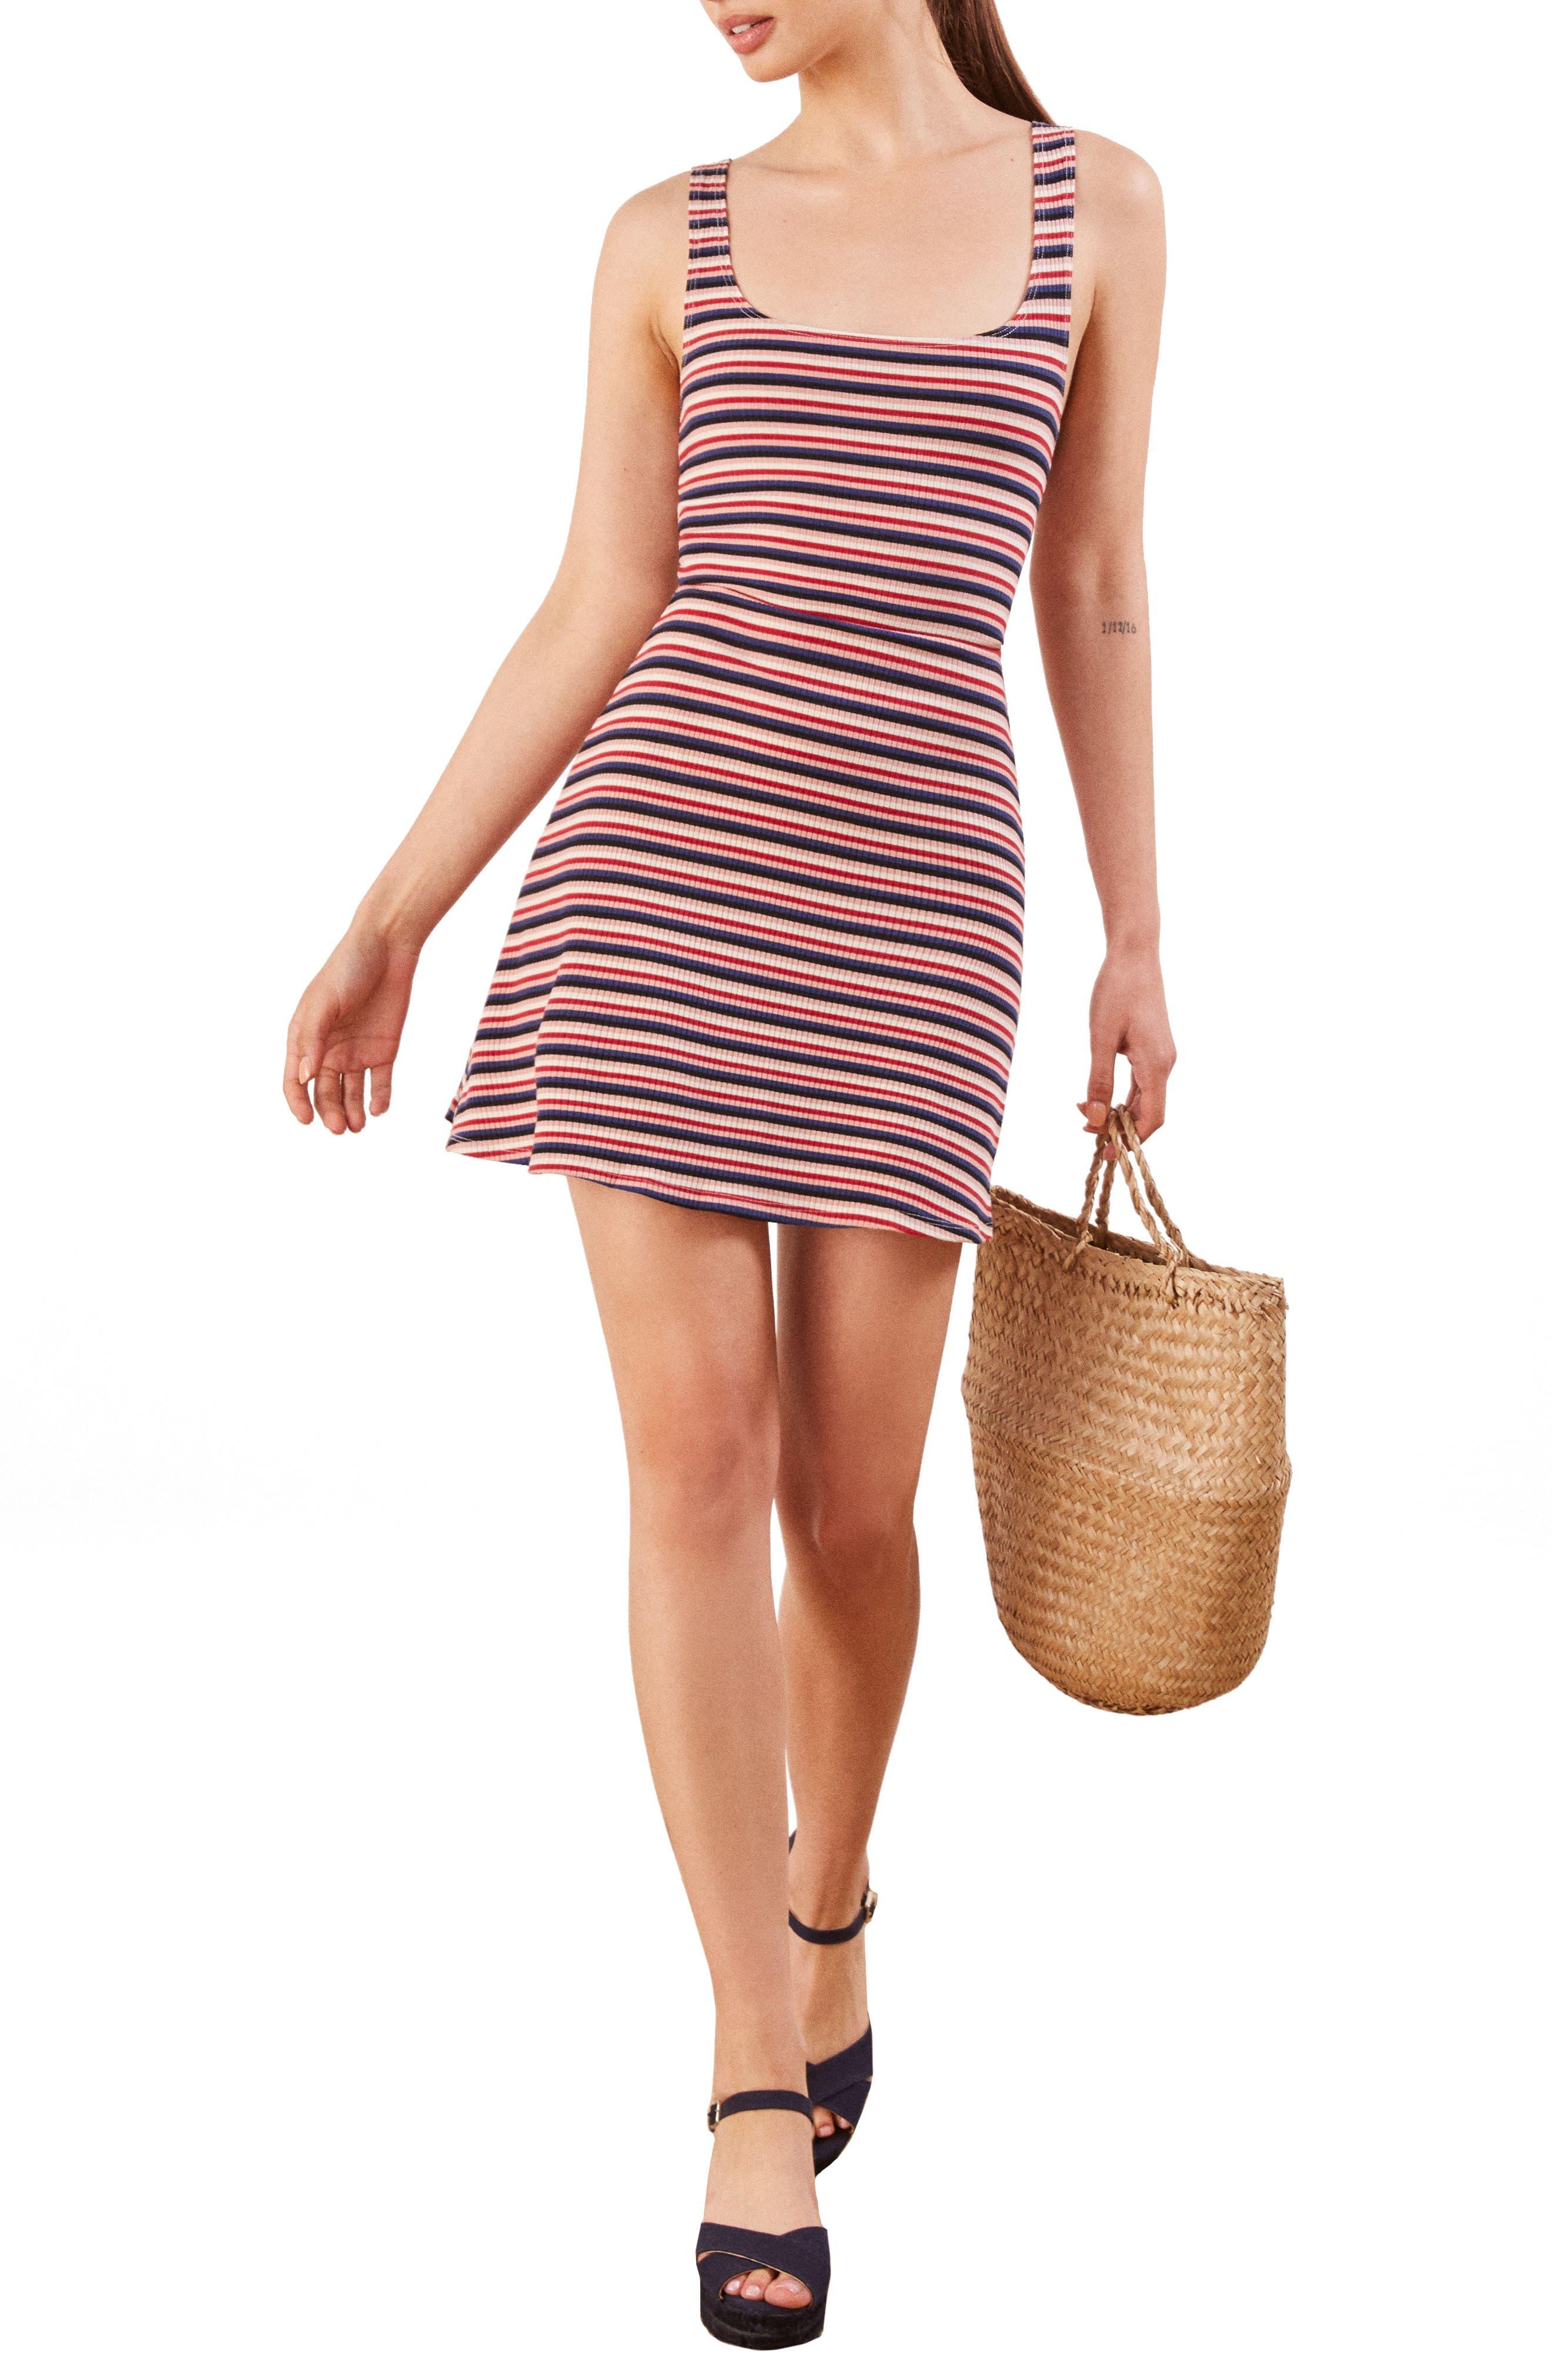 Reformation Mia Tank Dress, Pink